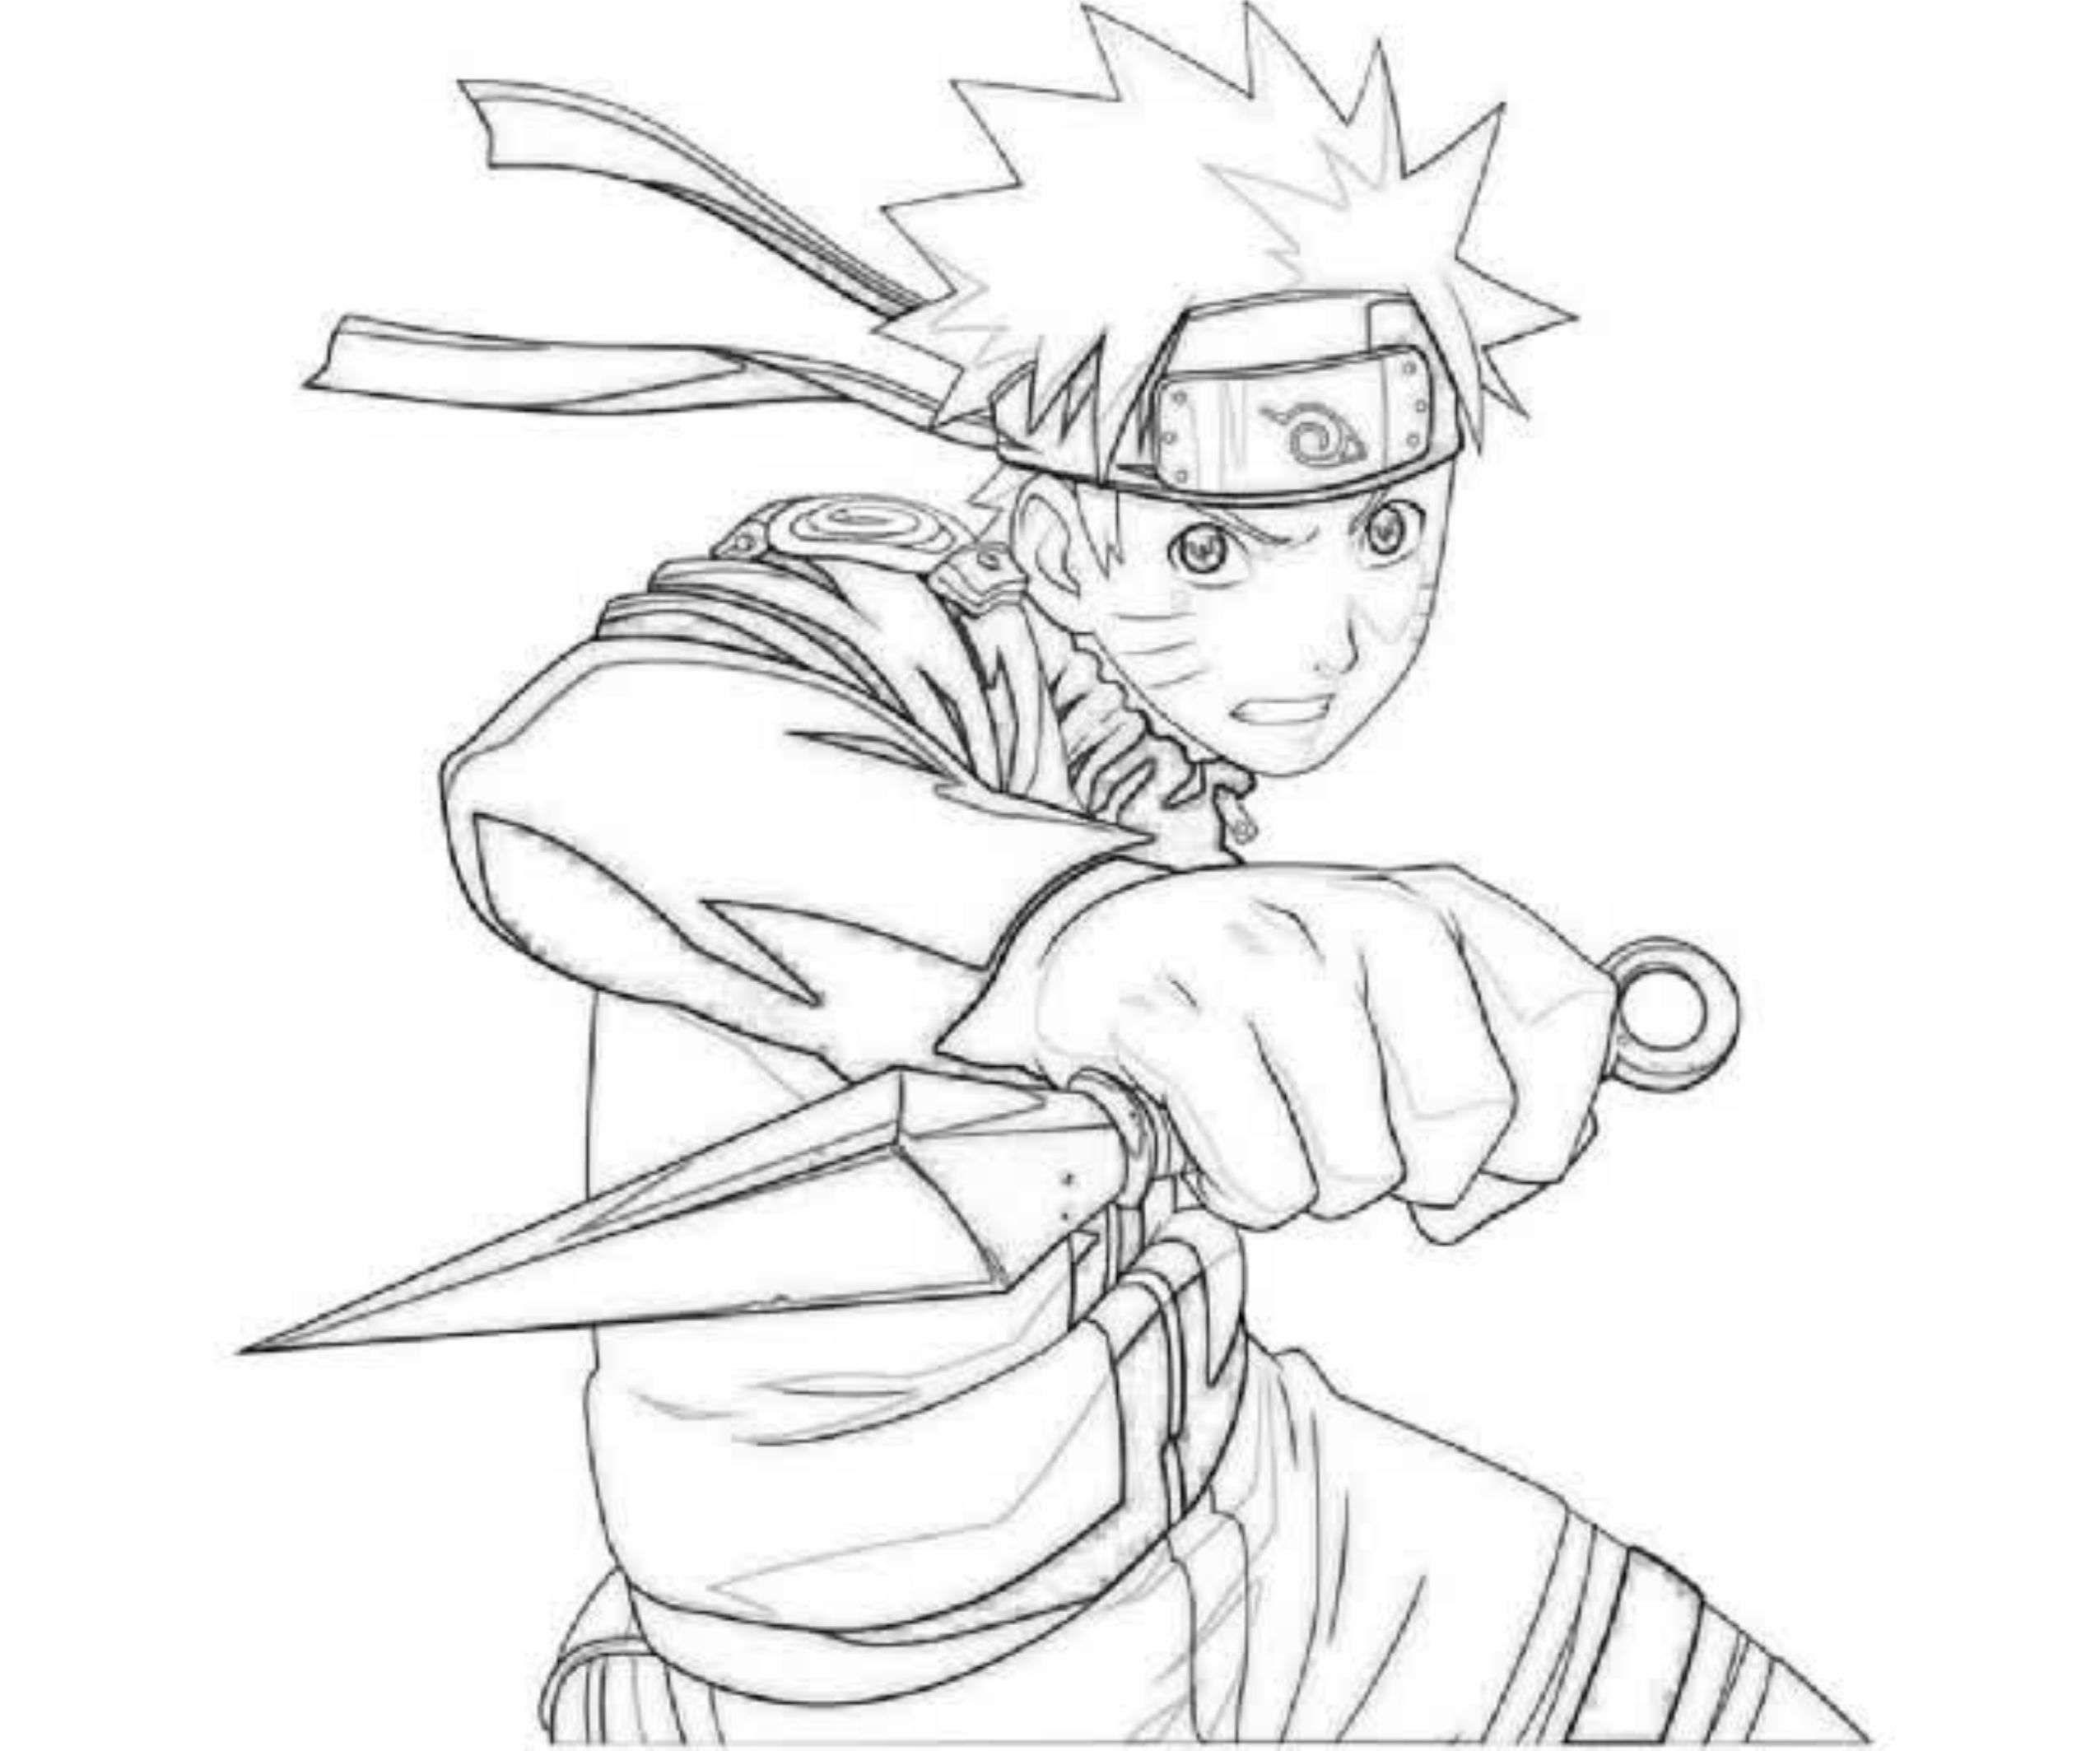 Beau Dessin Coloriage Naruto Shippuden